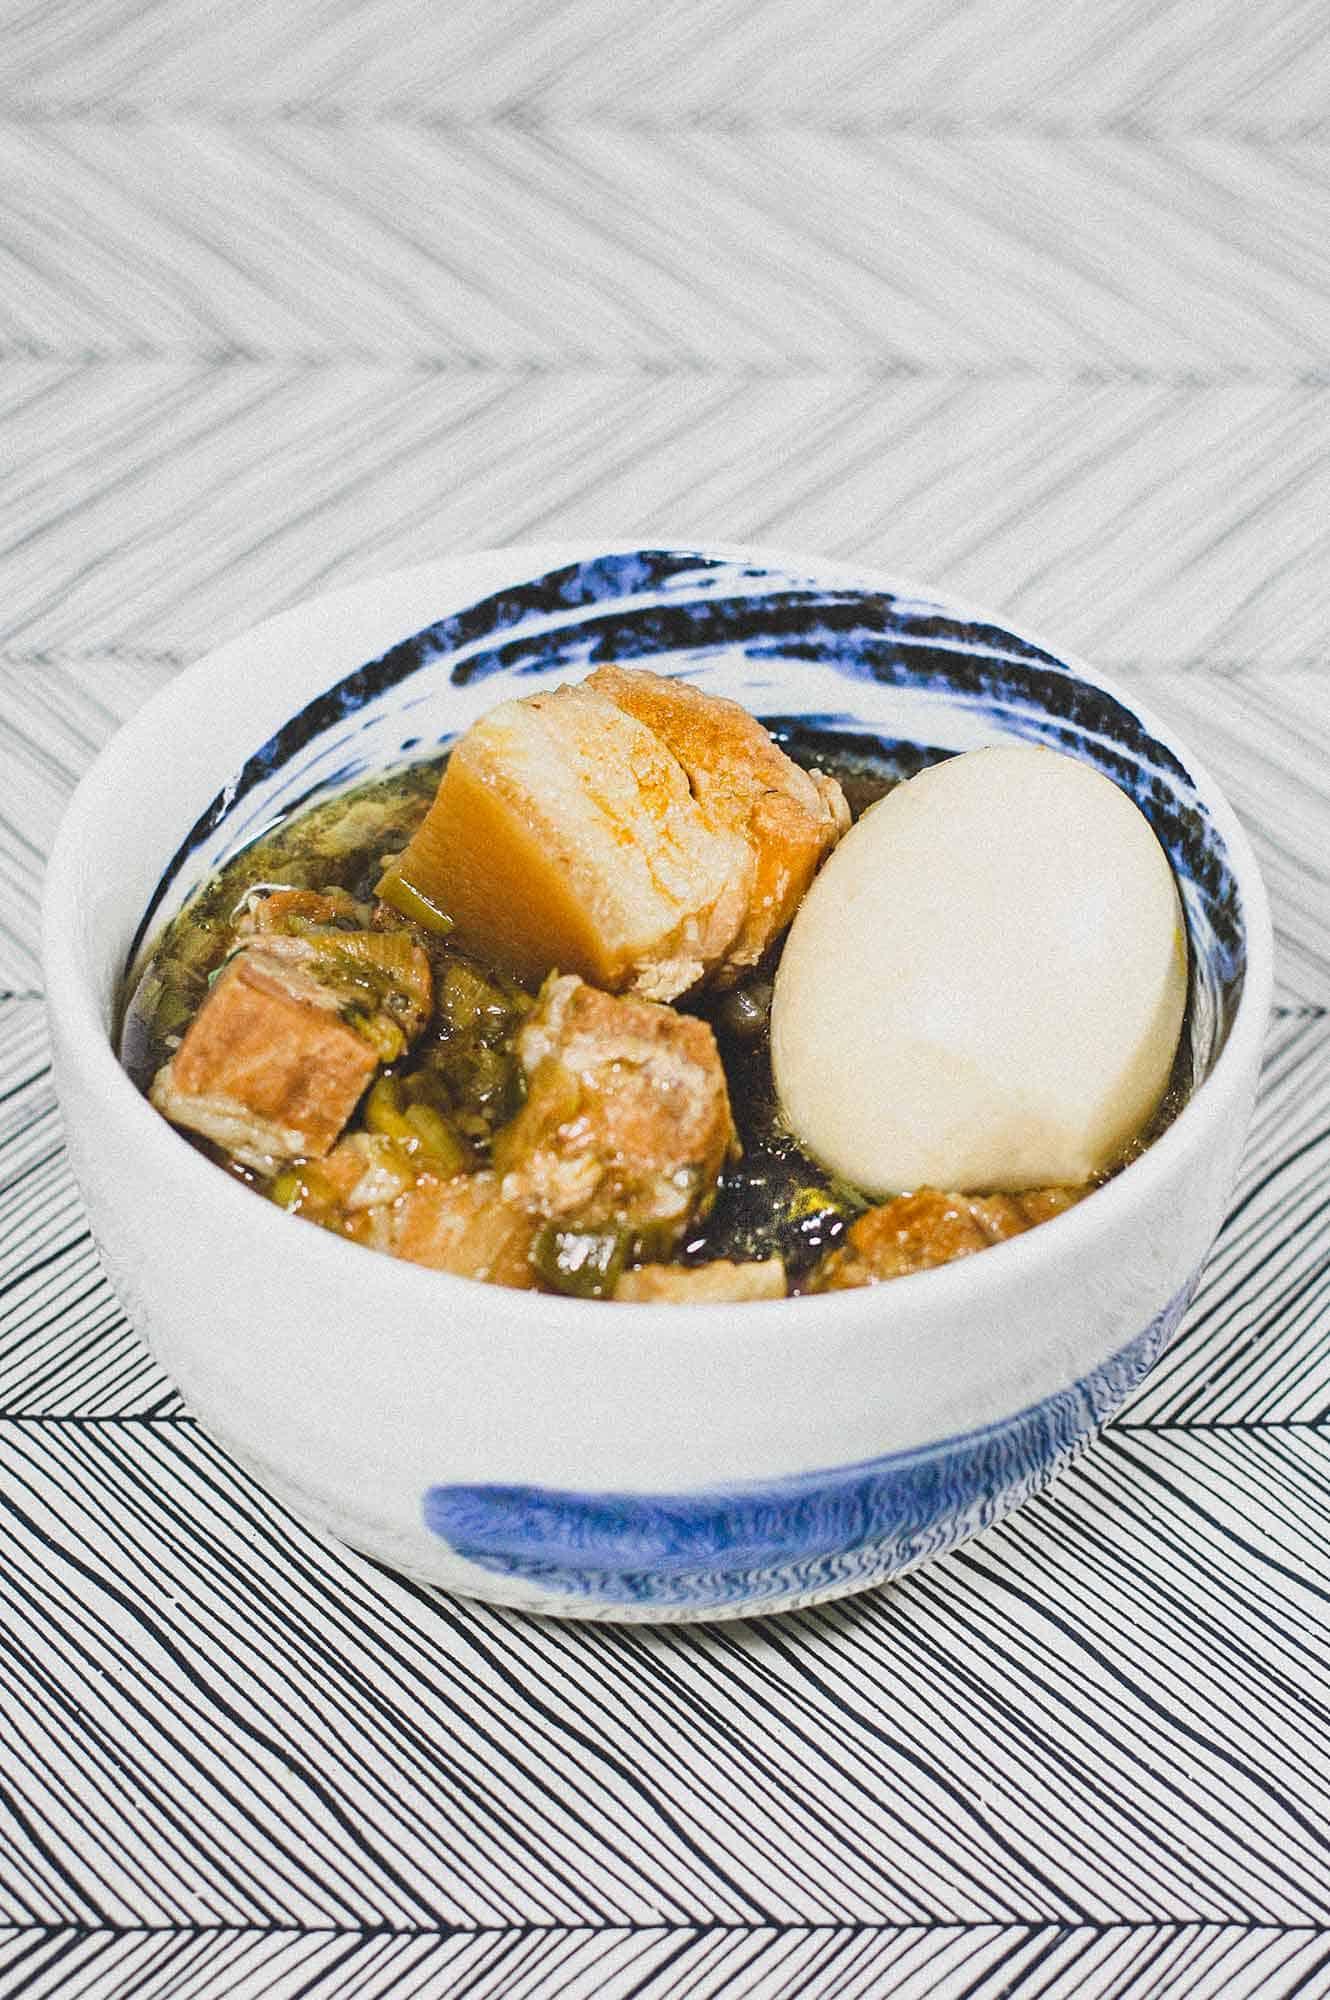 Vietnamese Braised Pork Belly with Eggs - Thit Kho